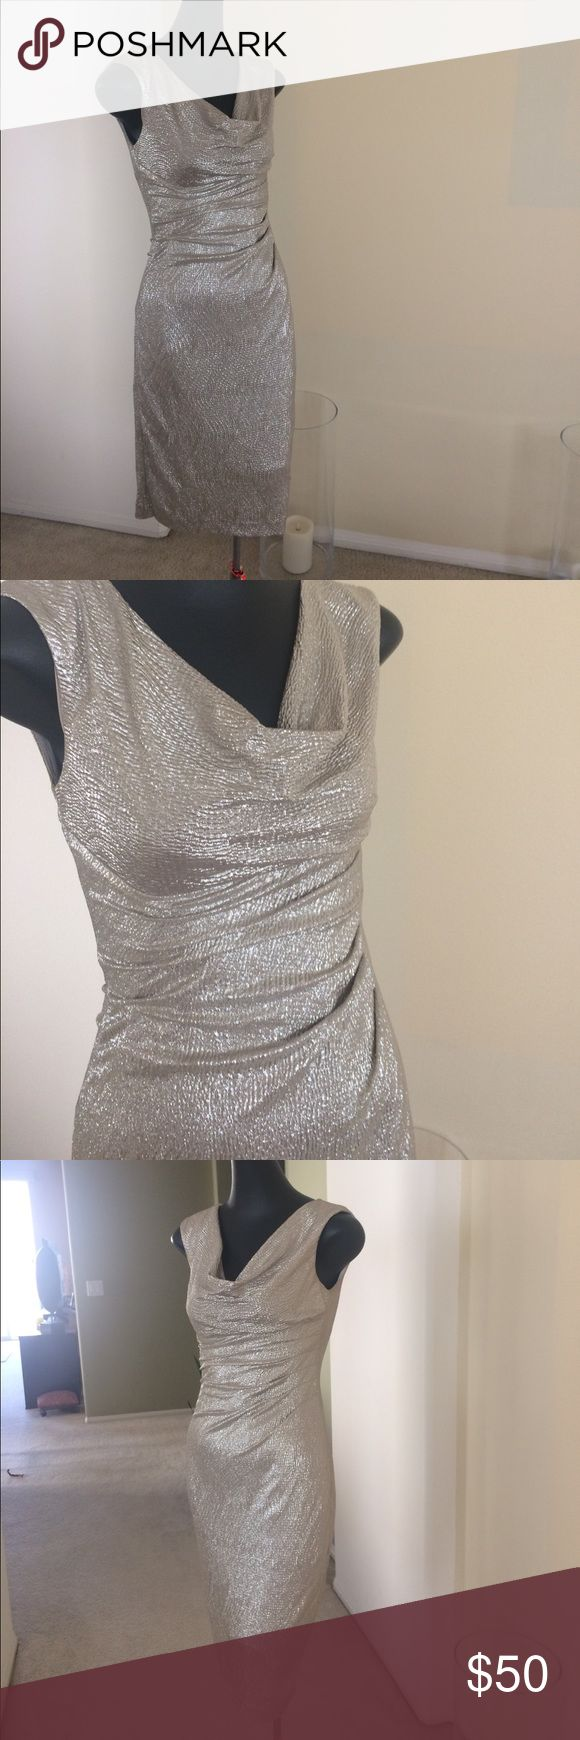 Lauren By Ralph Lauren dress Beautiful metallic gold dress. Draped front. Perfect for the holidays. Lauren Ralph Lauren Dresses Midi